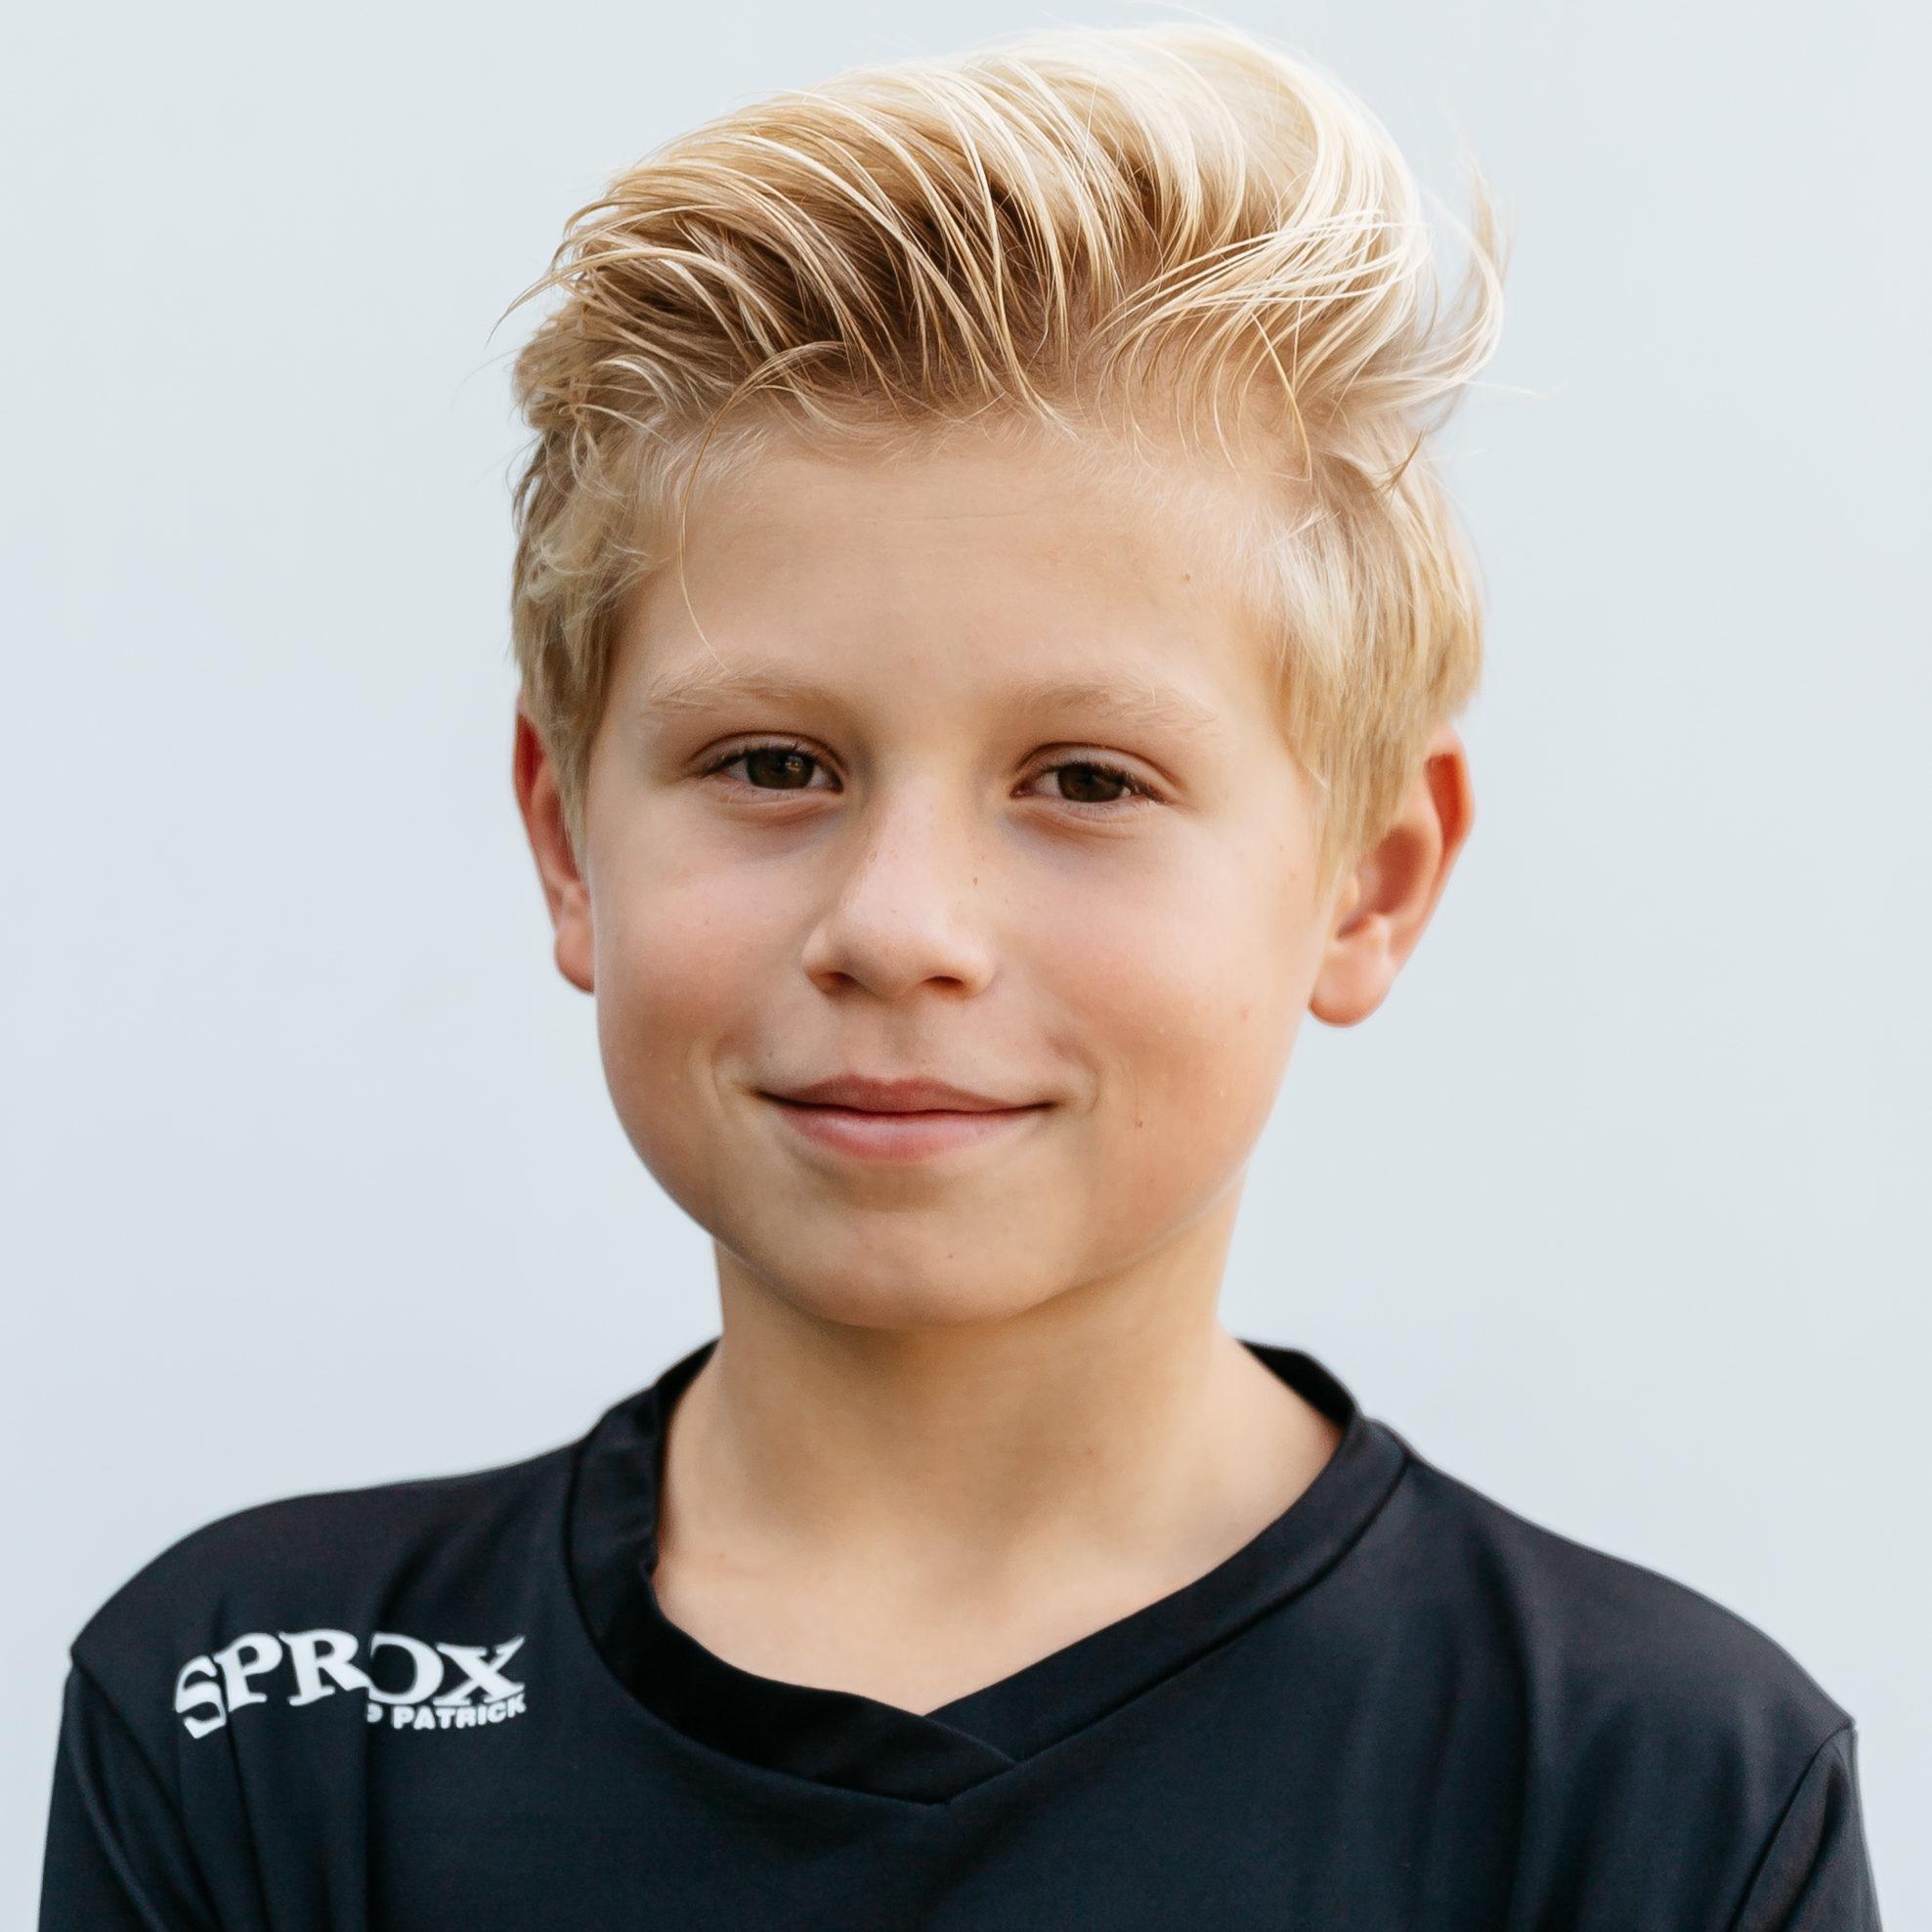 https://socceracademybreda.nl/wp-content/uploads/2017/05/SAB-Luuk-1-e1568206044370.jpg